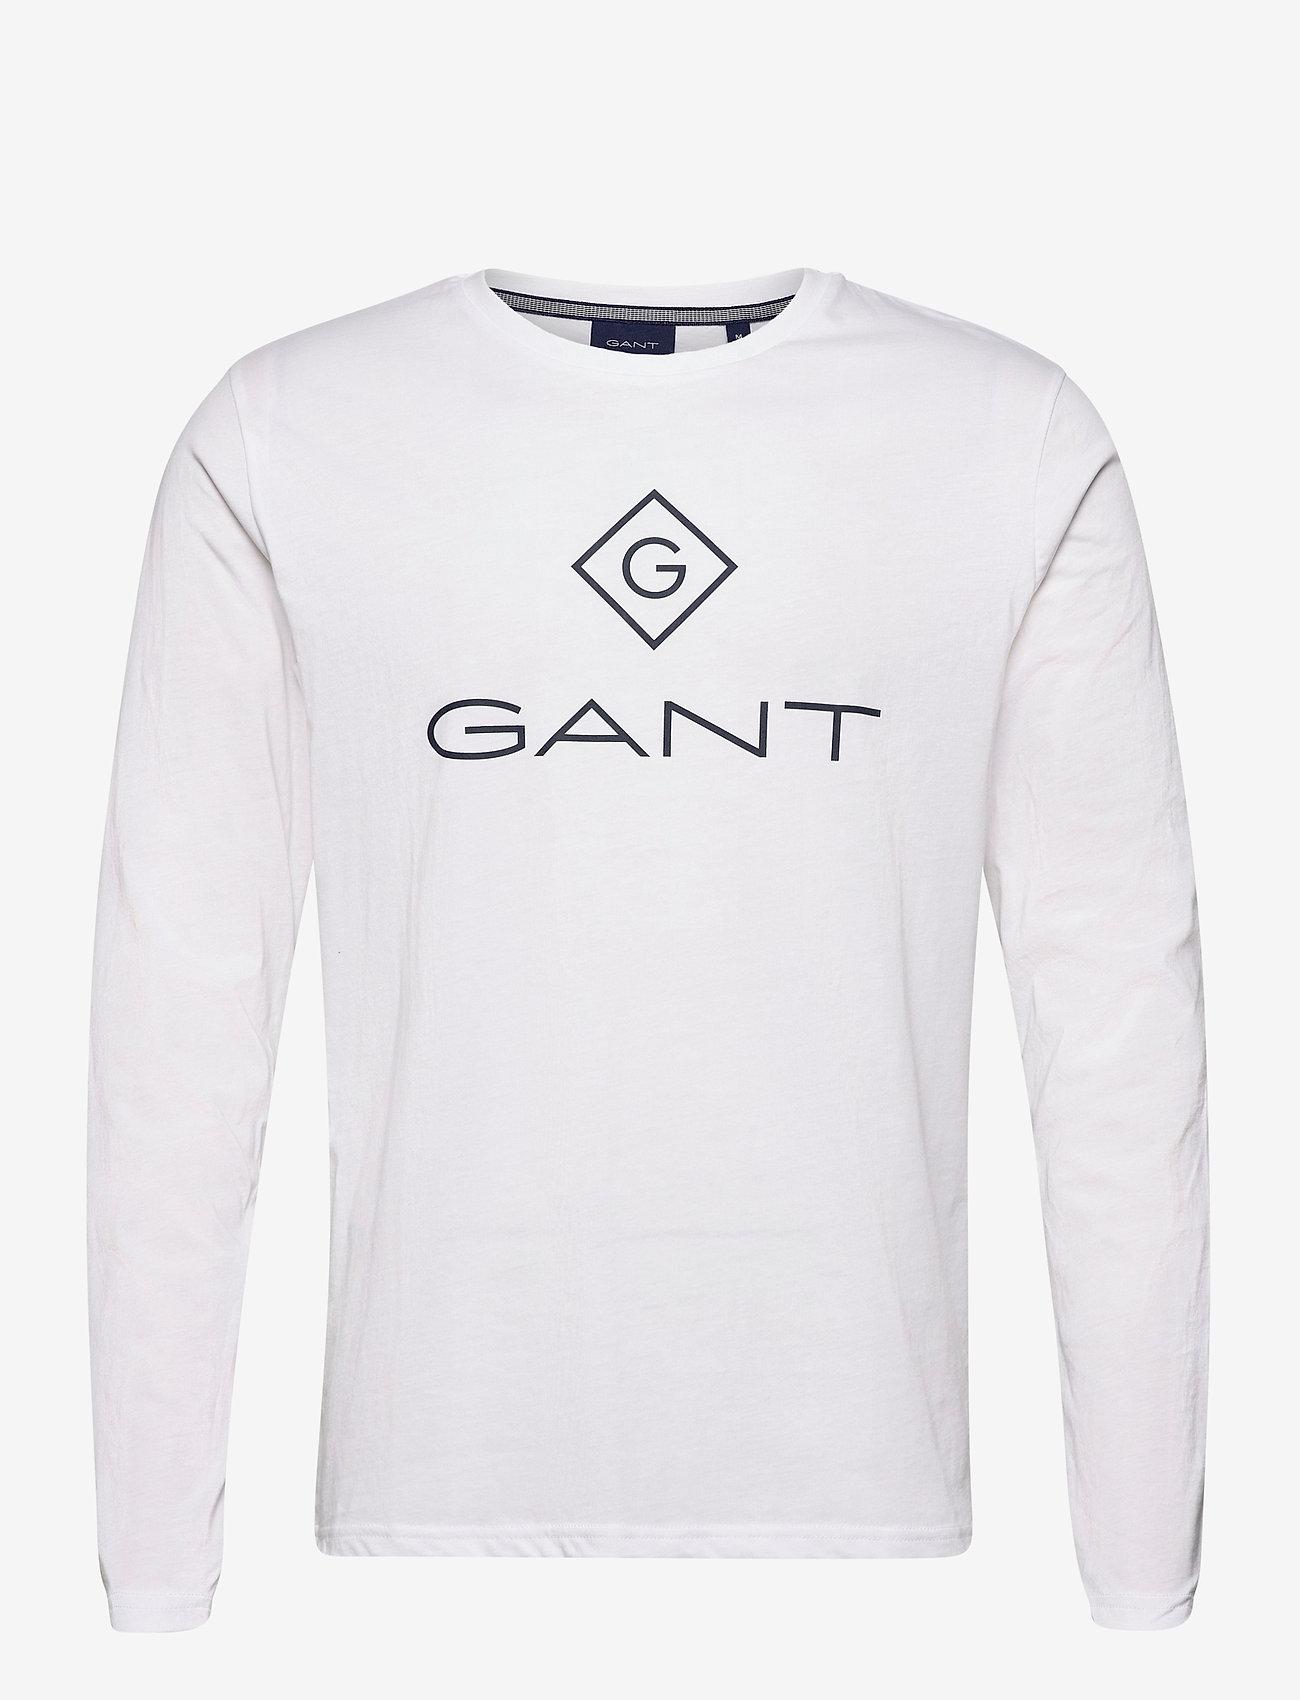 GANT - GANT LOCK UP LS T-SHIRT - long-sleeved t-shirts - white - 0